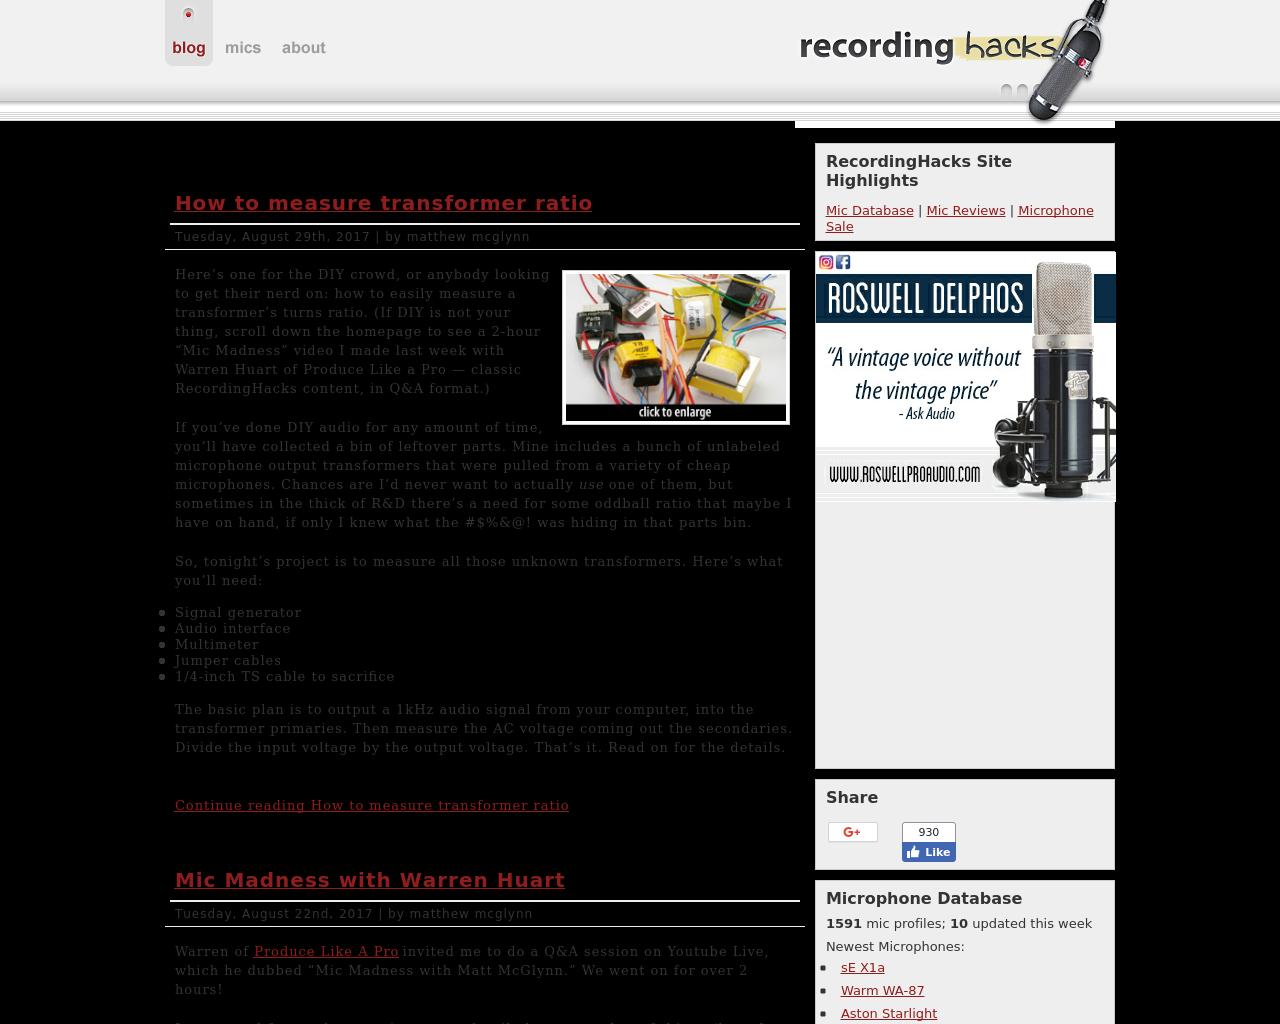 Recording-Hacks-Advertising-Reviews-Pricing